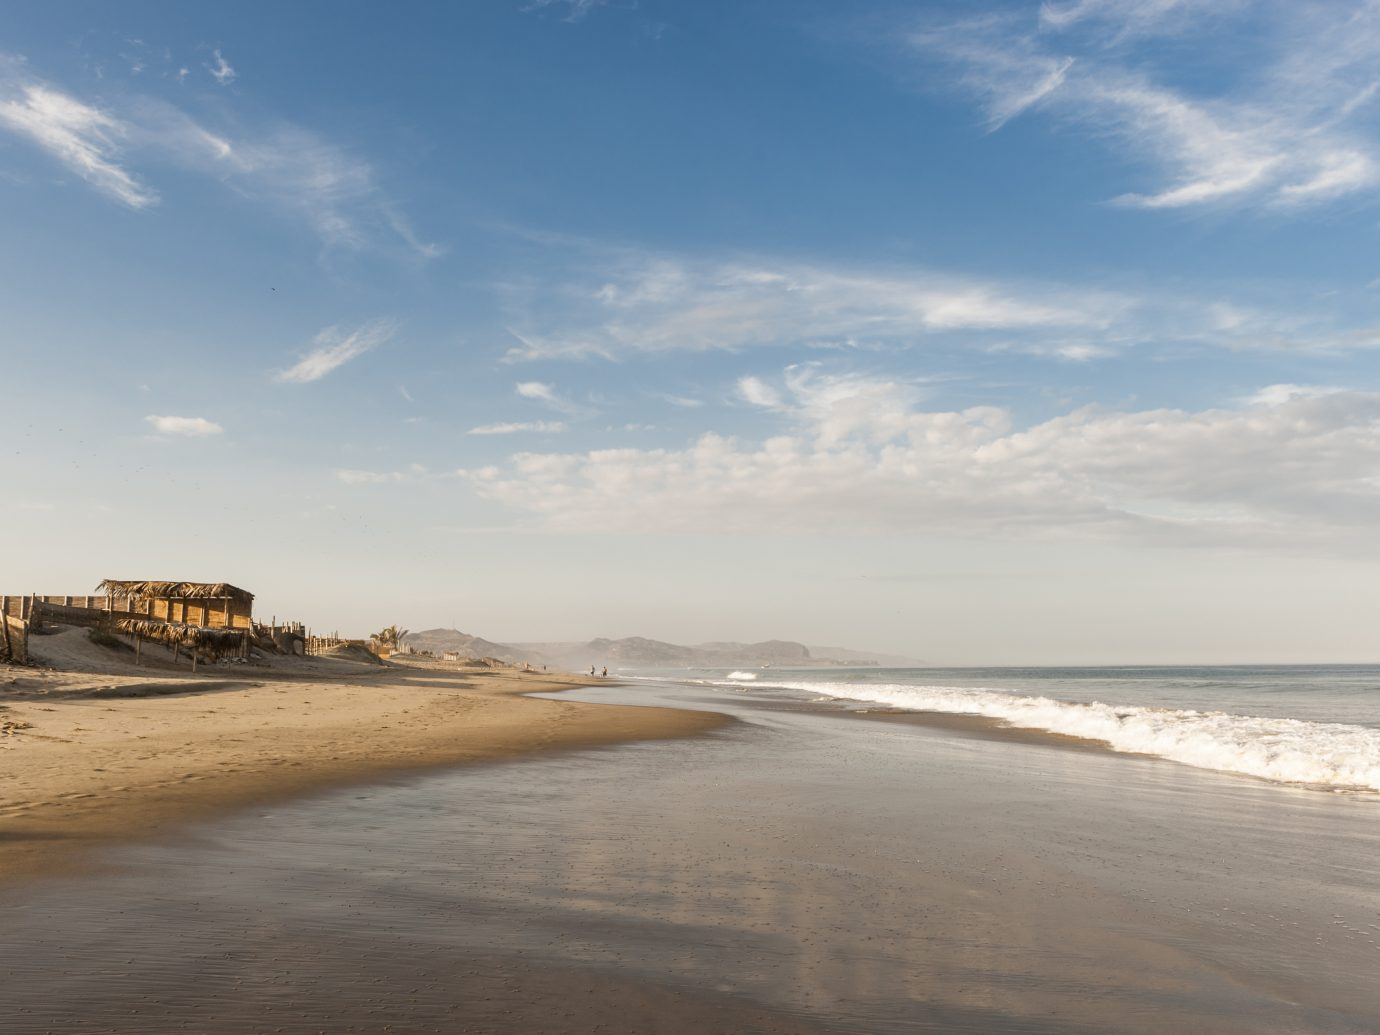 Mancora in Peru, popular northern beach and surf town